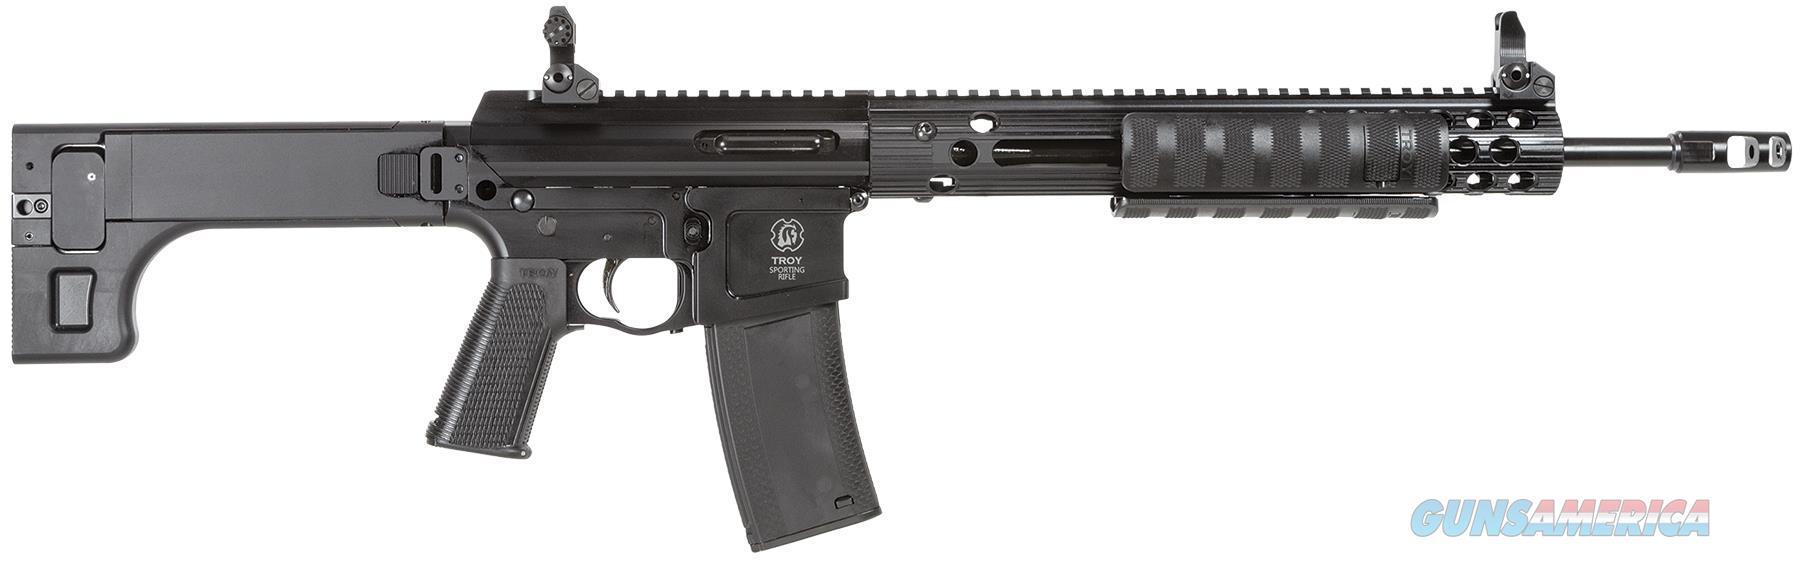 "Troy Spmpar000bt Par Sporting Rifle Pump 223Rem/5.56 16"" Mb 10+1 5Pos Stk Black SPMP-AR0-00BT-00  Guns > Rifles > TU Misc Rifles"